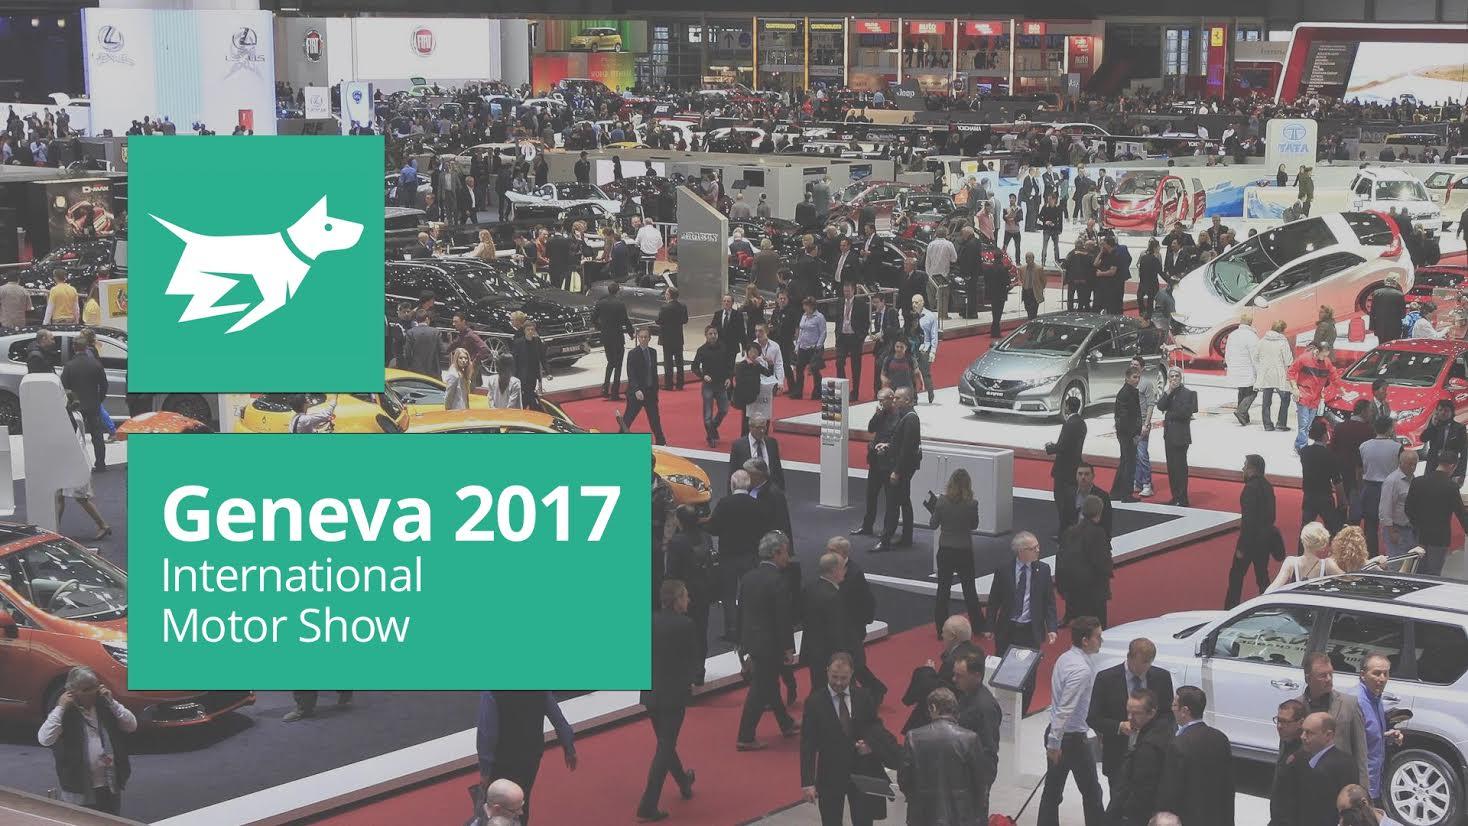 Chasing Cars Geneva 2017 Header Image